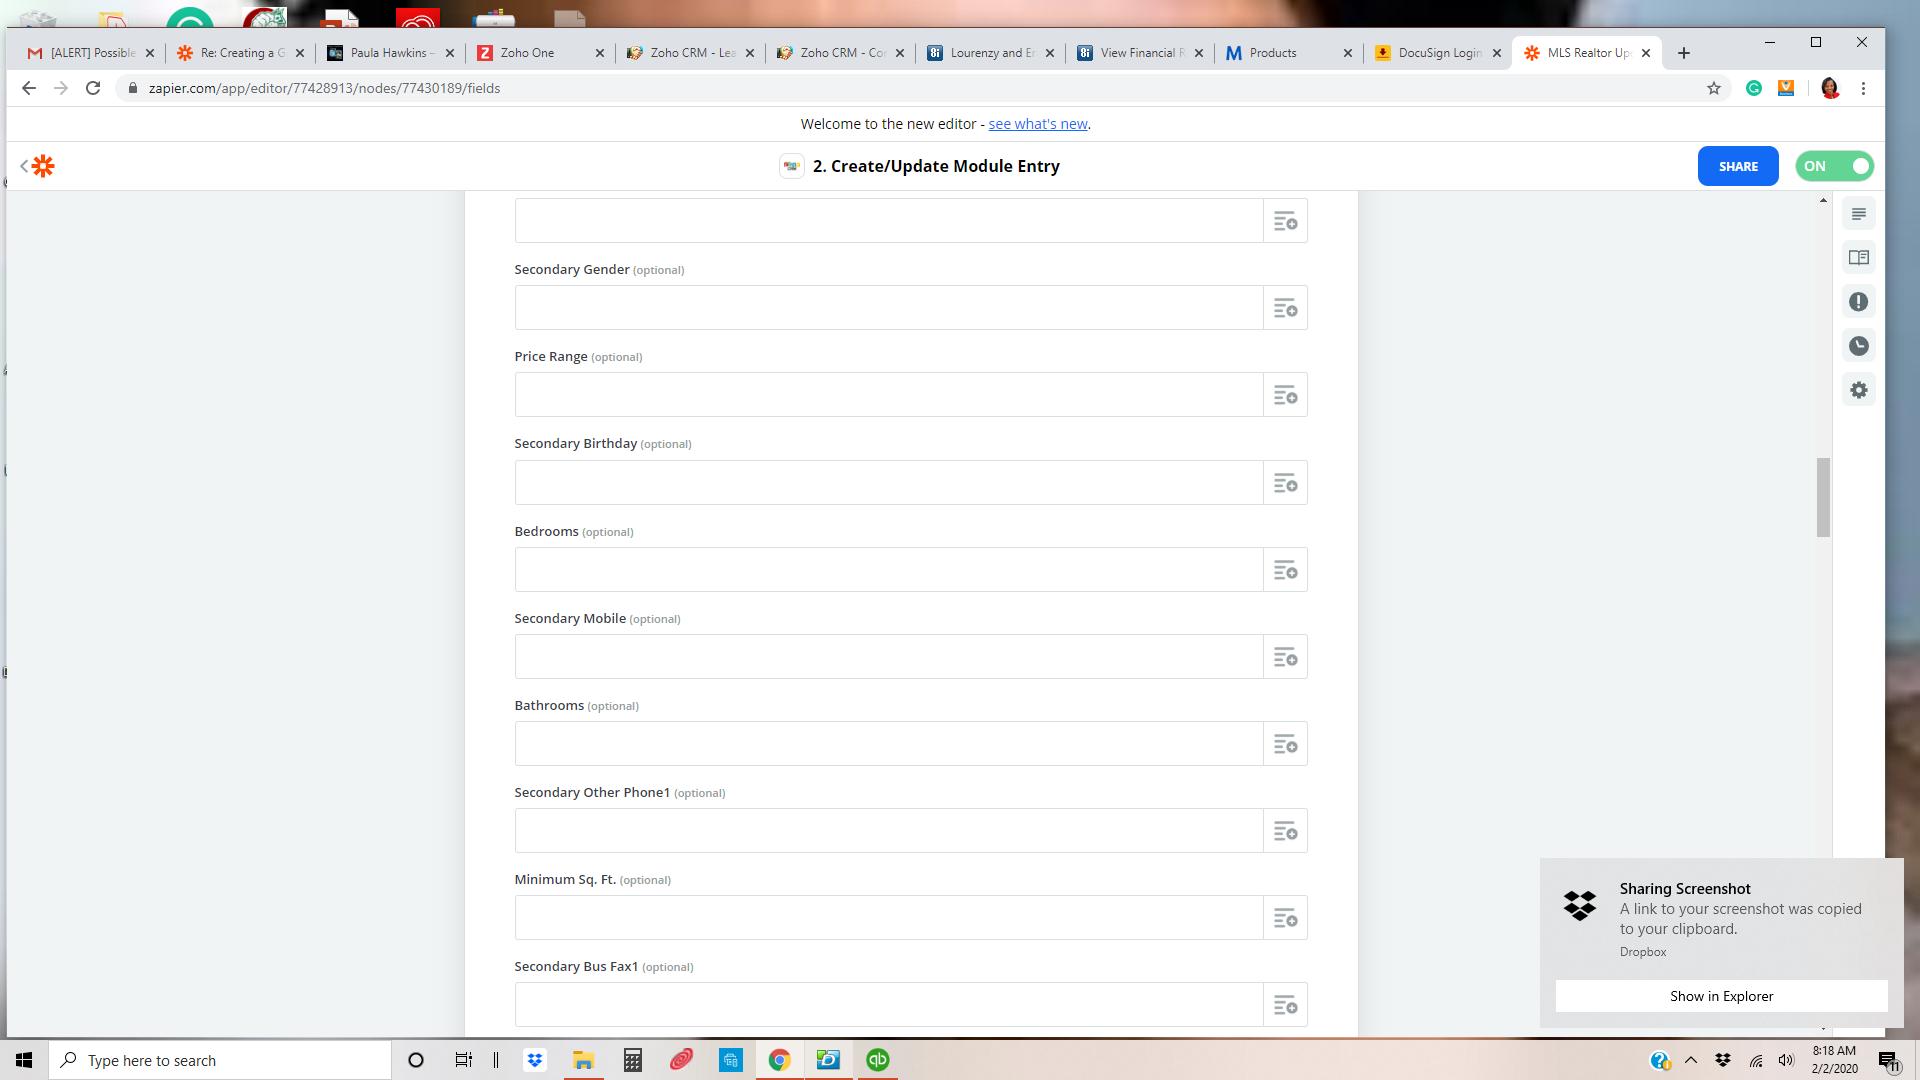 Screenshot 2020-02-02 08.18.19.png